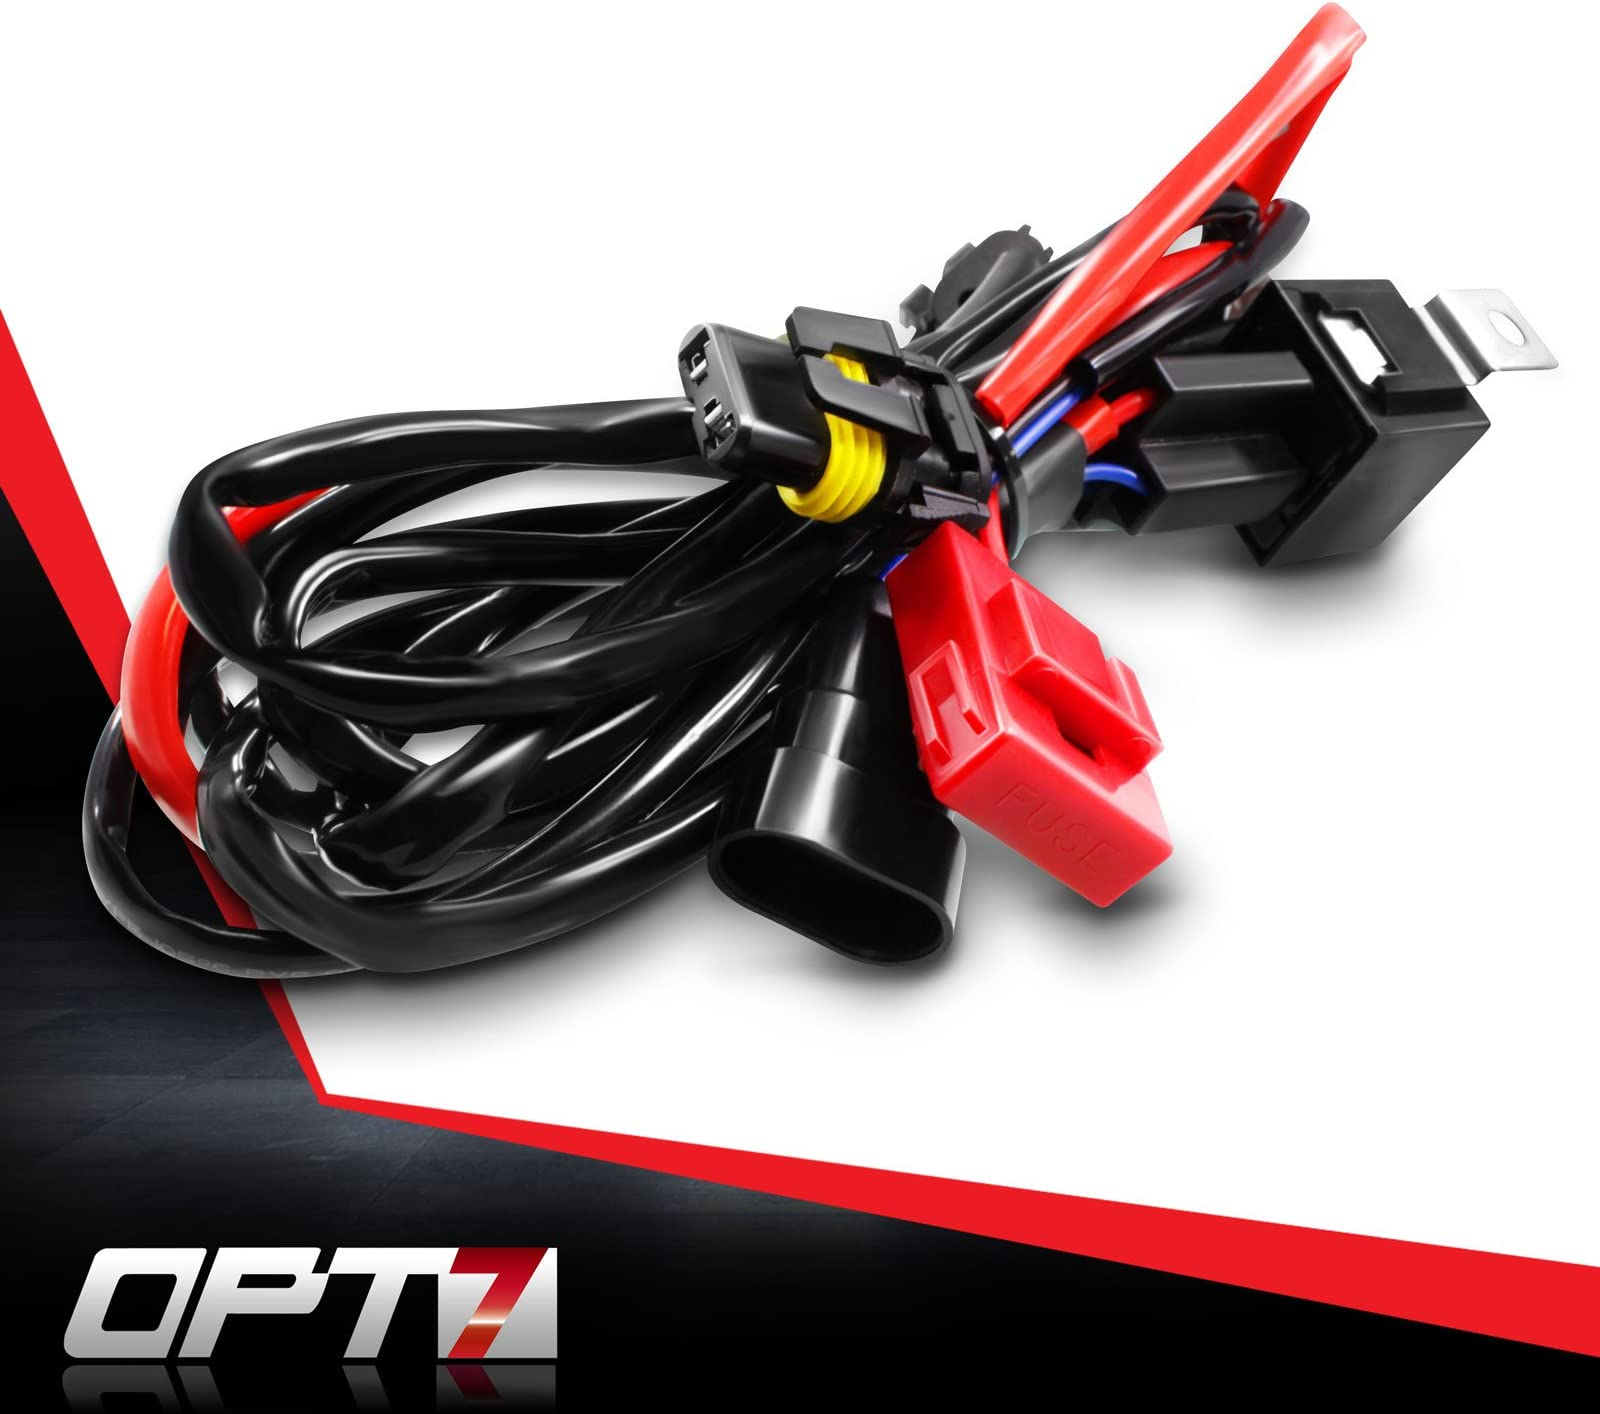 amazon com hid kits lighting conversion kits automotiveopt7 hid relay harness anti flicker power wiring for opt7 xenon kits